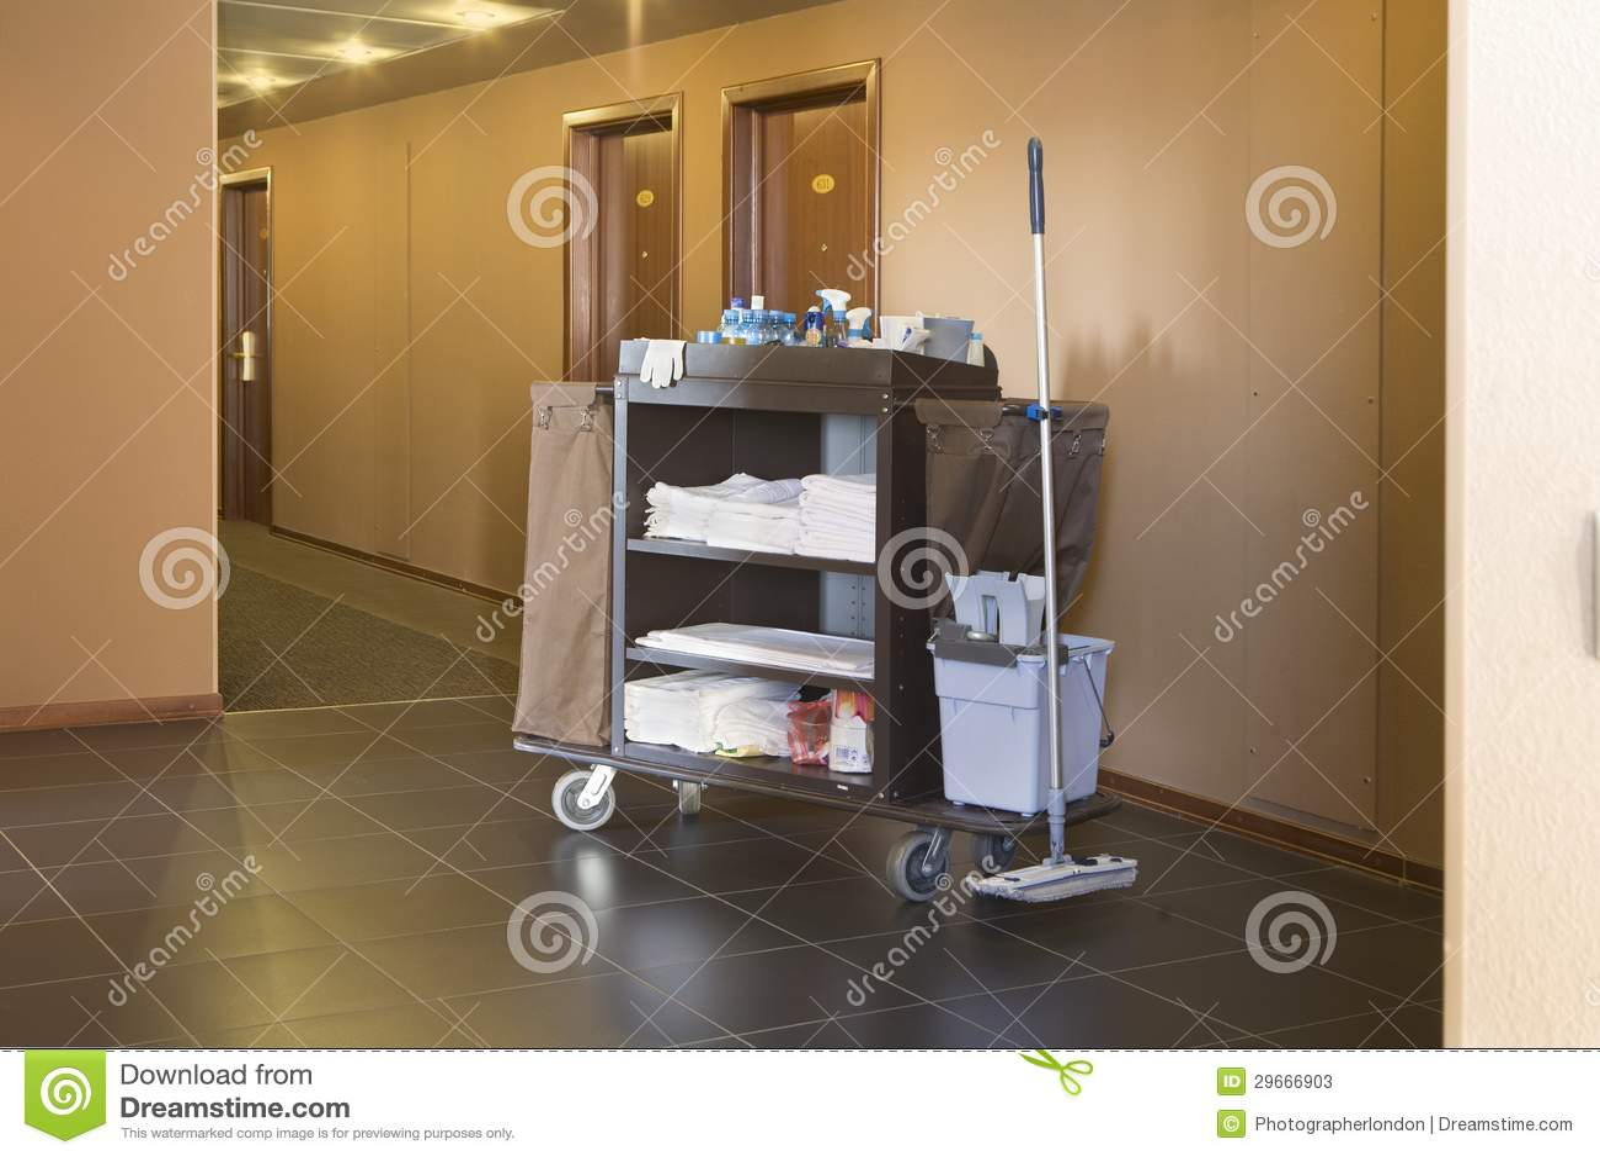 hotel housekeeping cart stock image image of passage. Black Bedroom Furniture Sets. Home Design Ideas